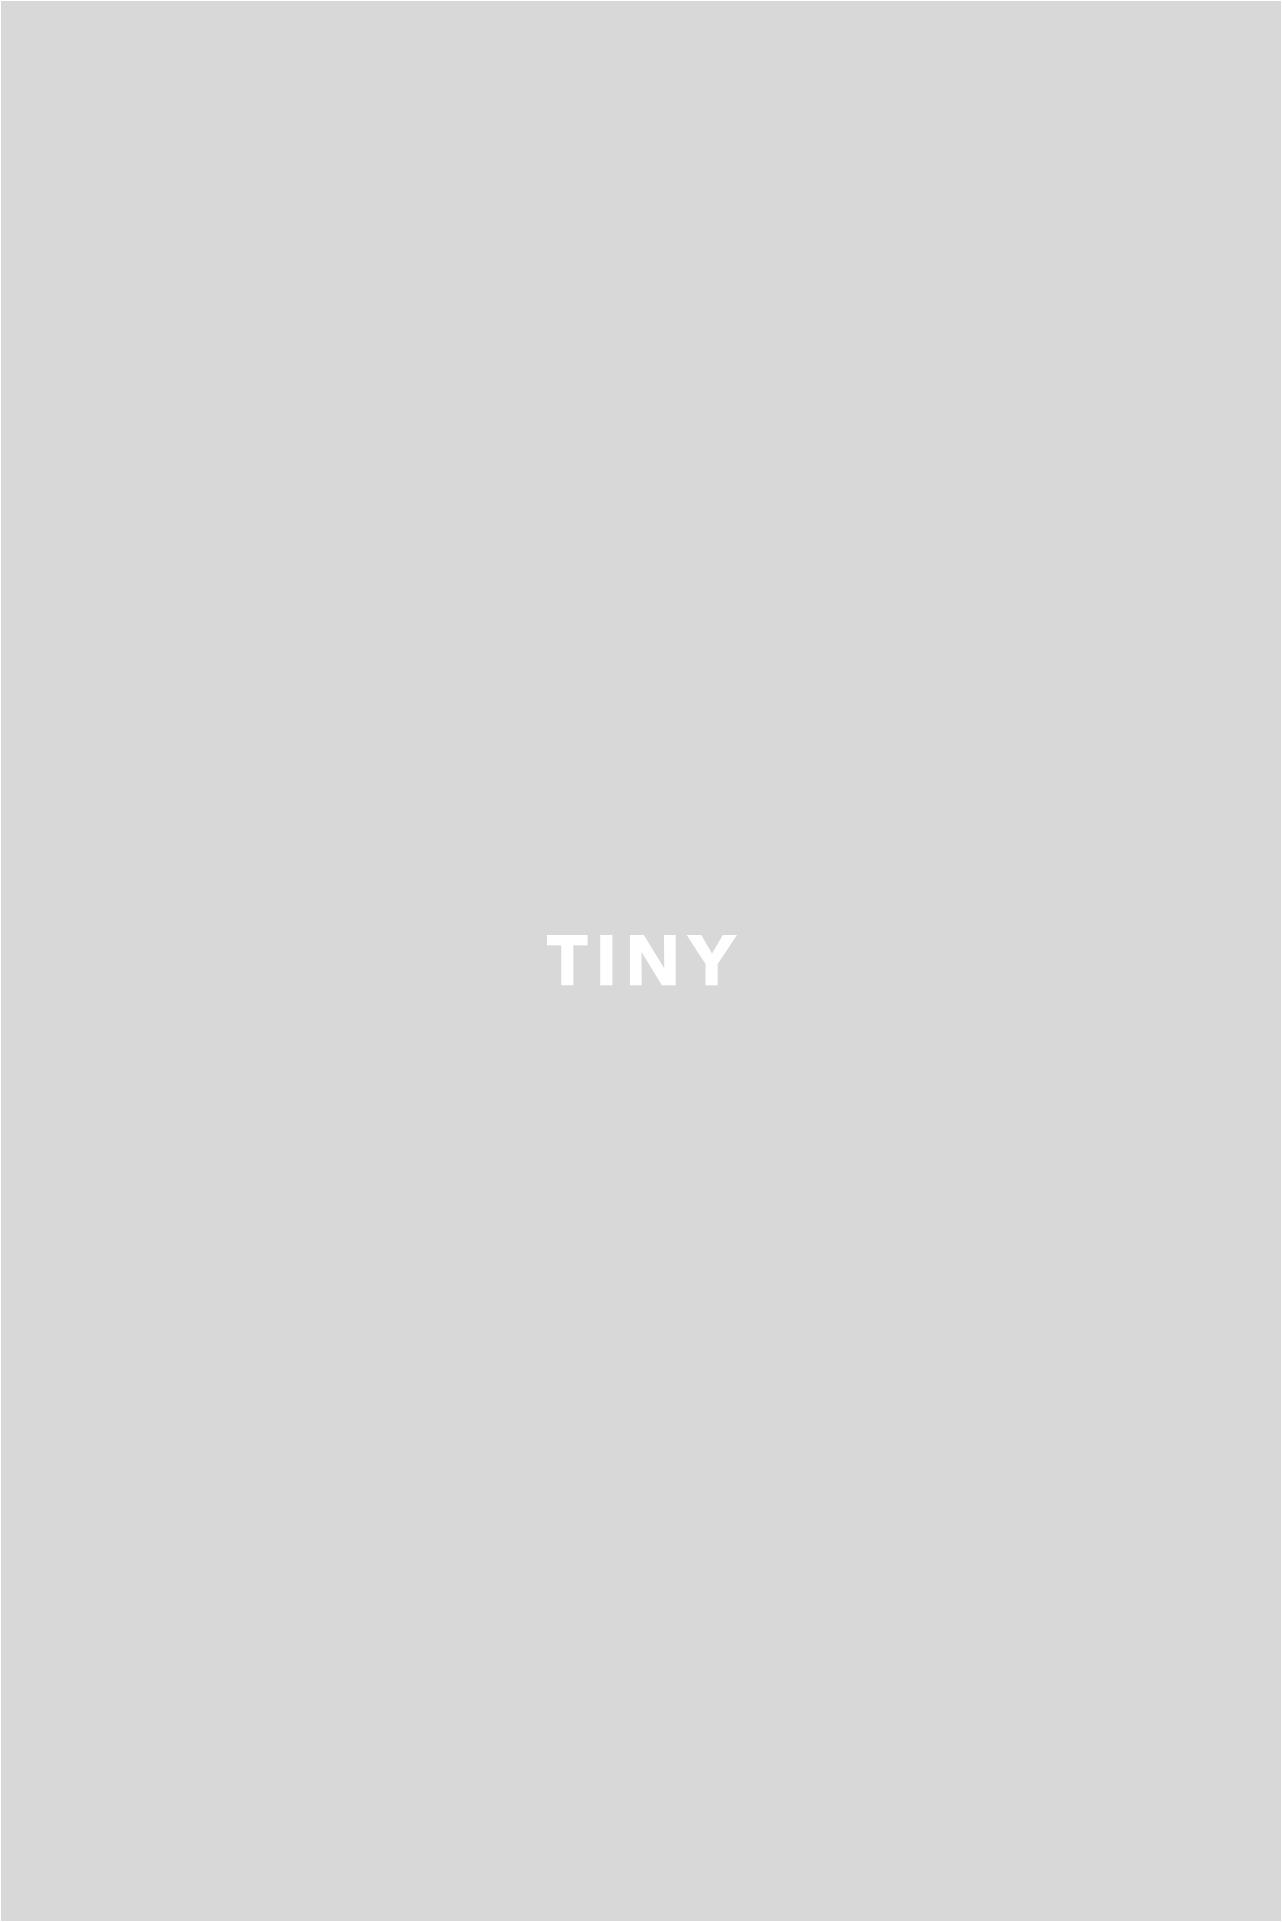 Adidas Gazelle - soft vision/Orchid Tint/Ecru Tint